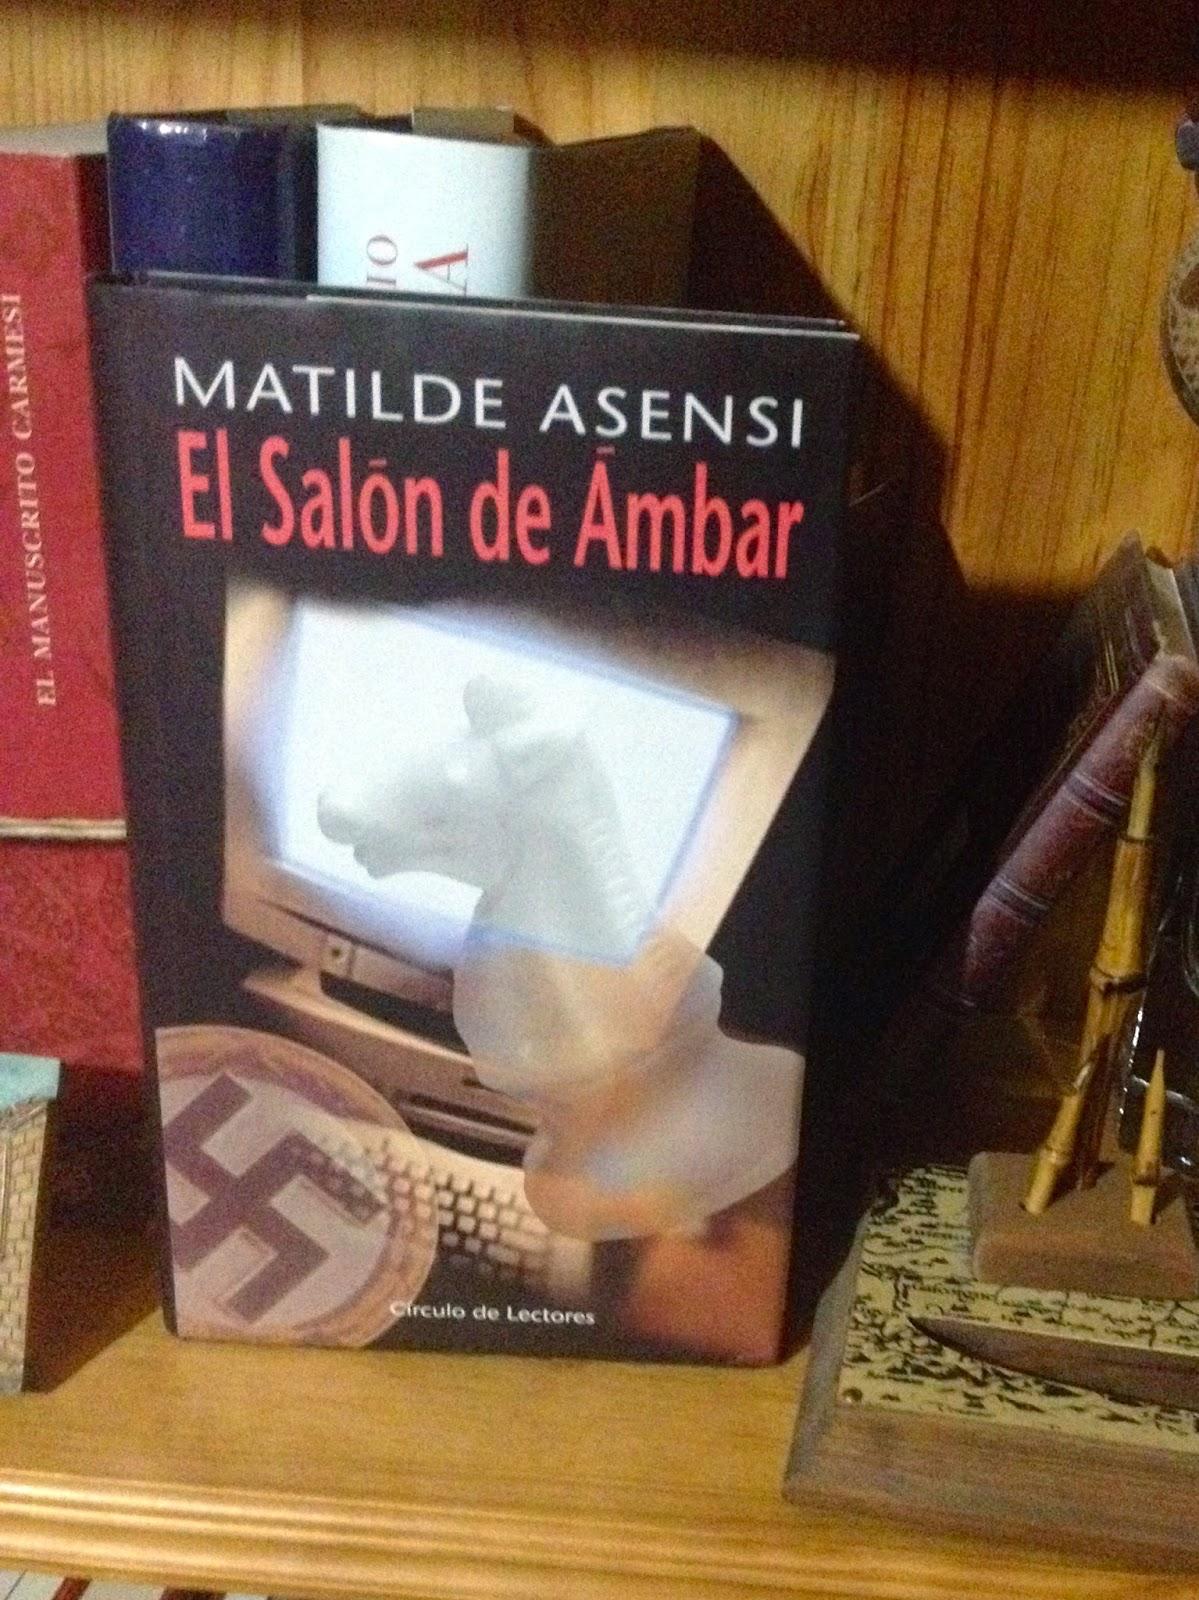 Libro de autor espa ol el sal n de mbar